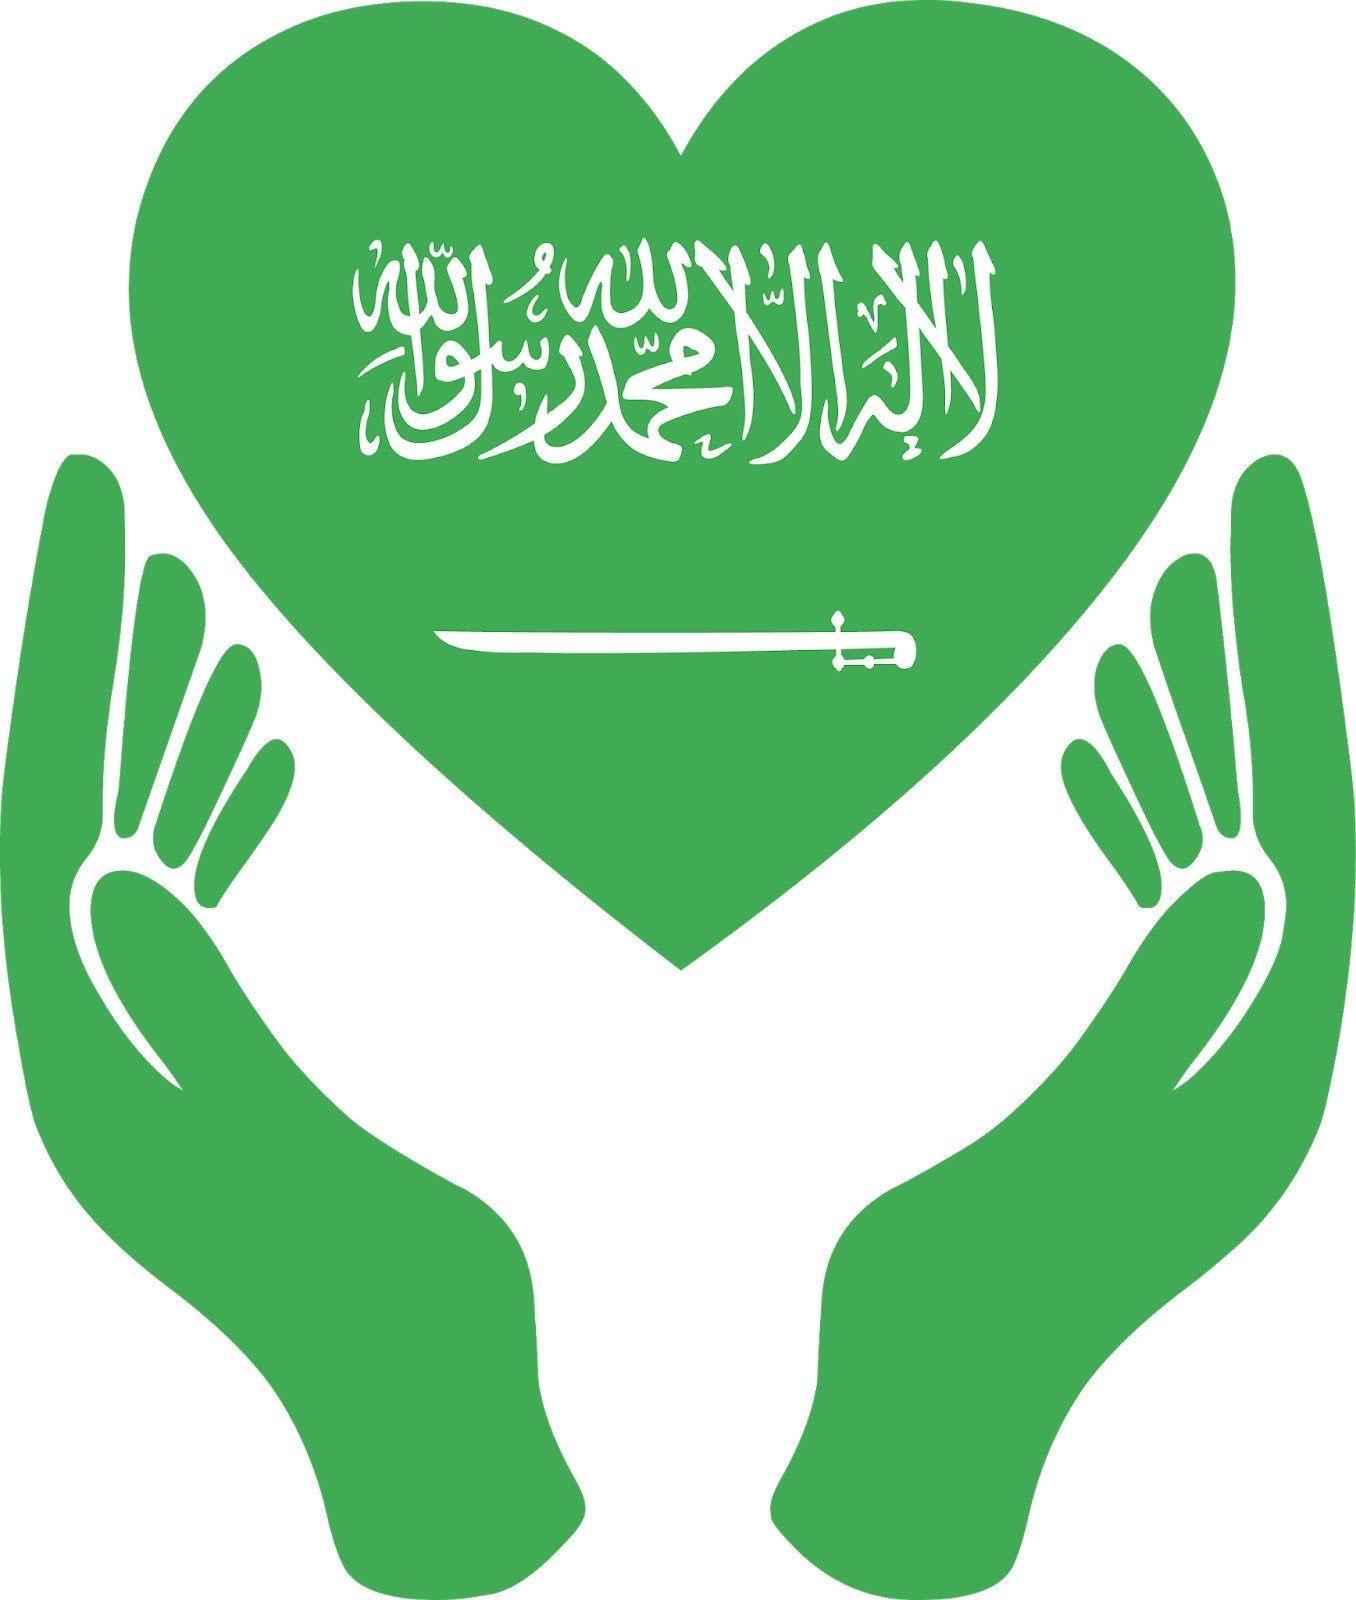 Pin By Albdr On دام عزك ياوطن National Day Saudi Saudi Arabia Flag Birthday Balloons Clipart